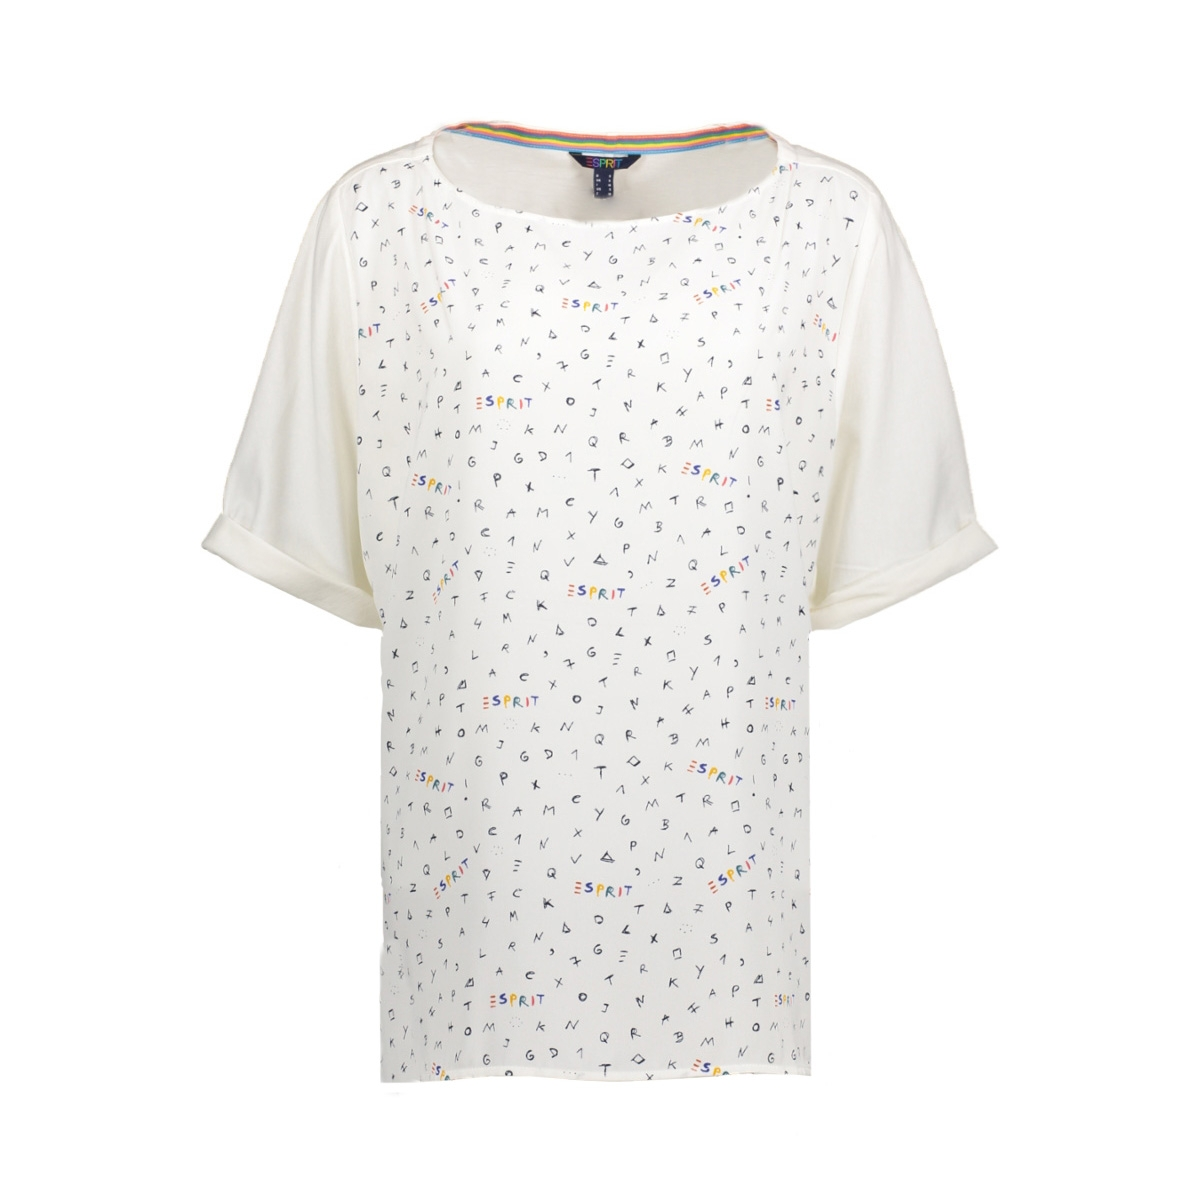 097ee1f040 esprit t-shirt e110